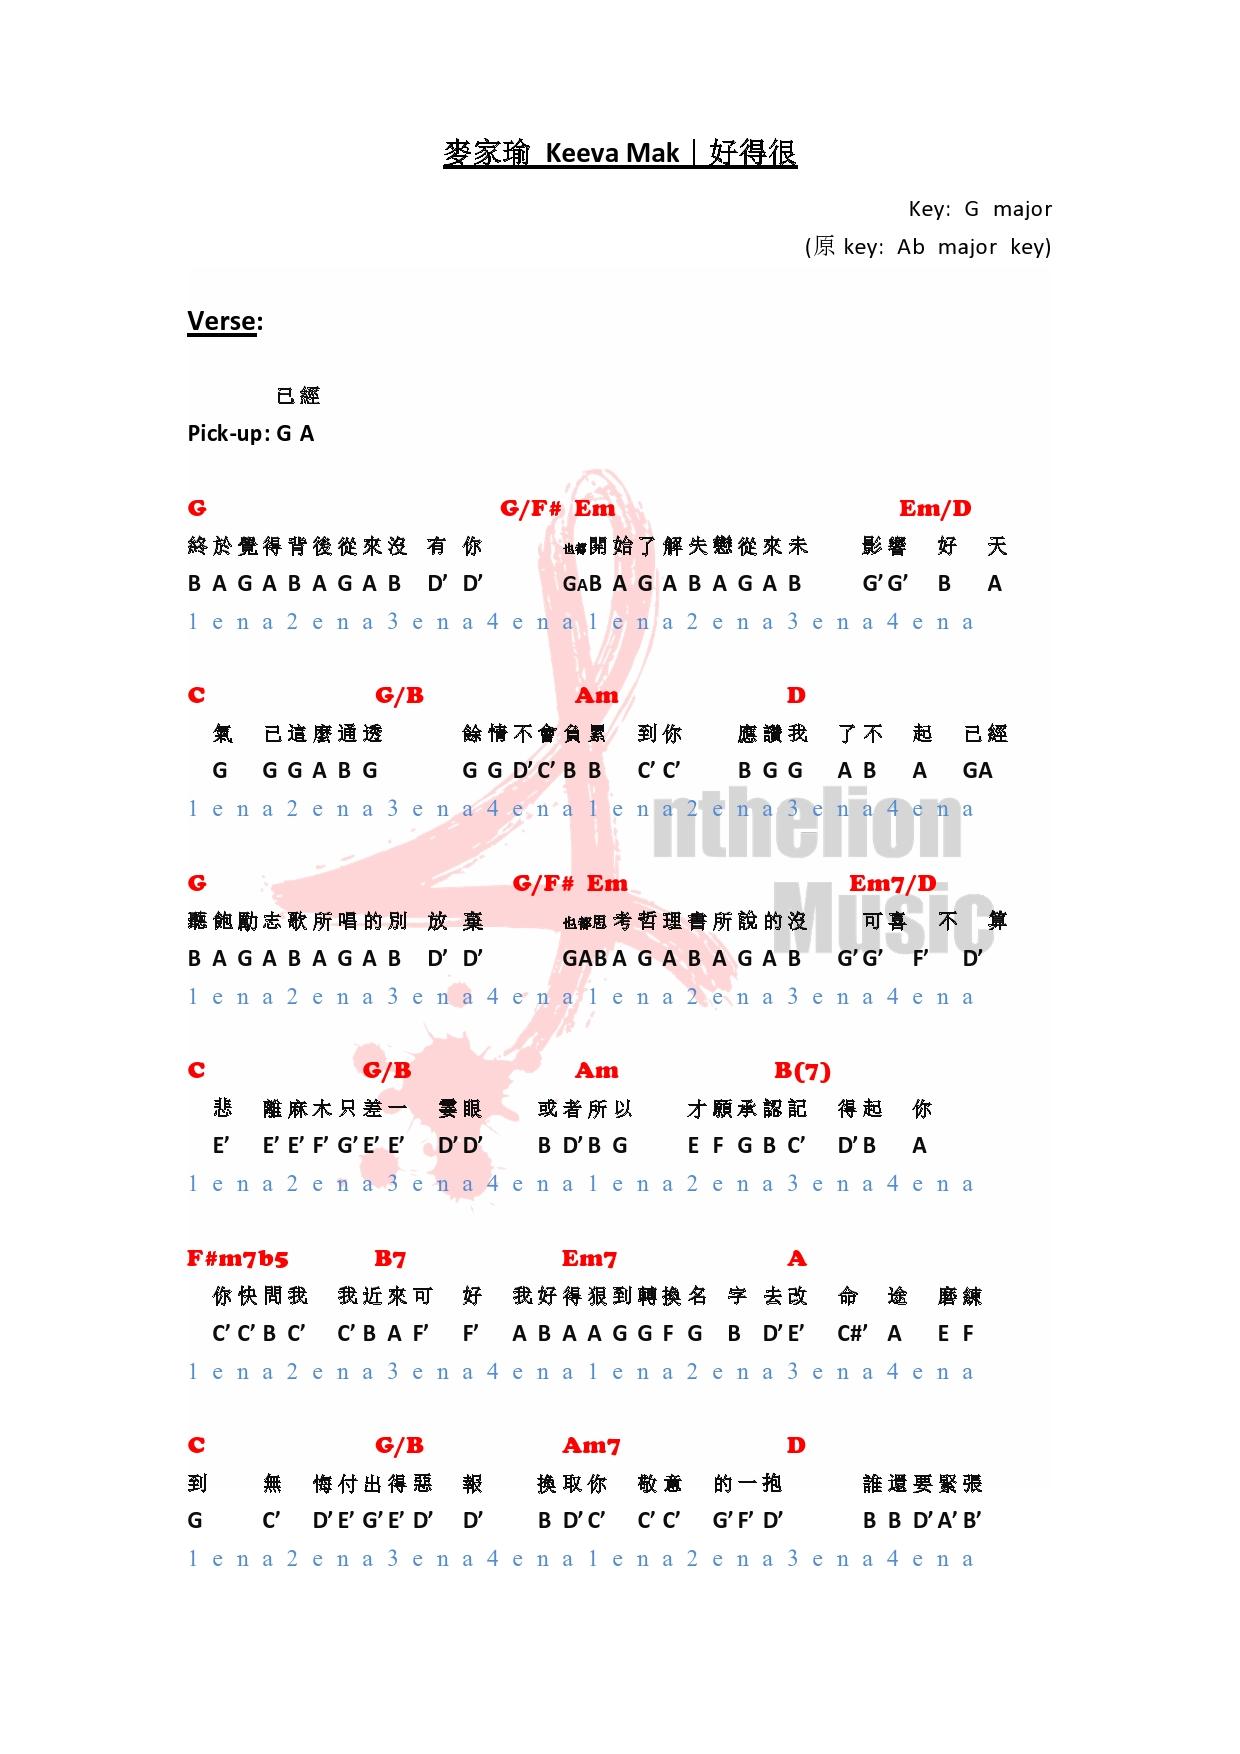 Anthelion Music 譜 template (好得很 with lyrics)-page0001.jpg